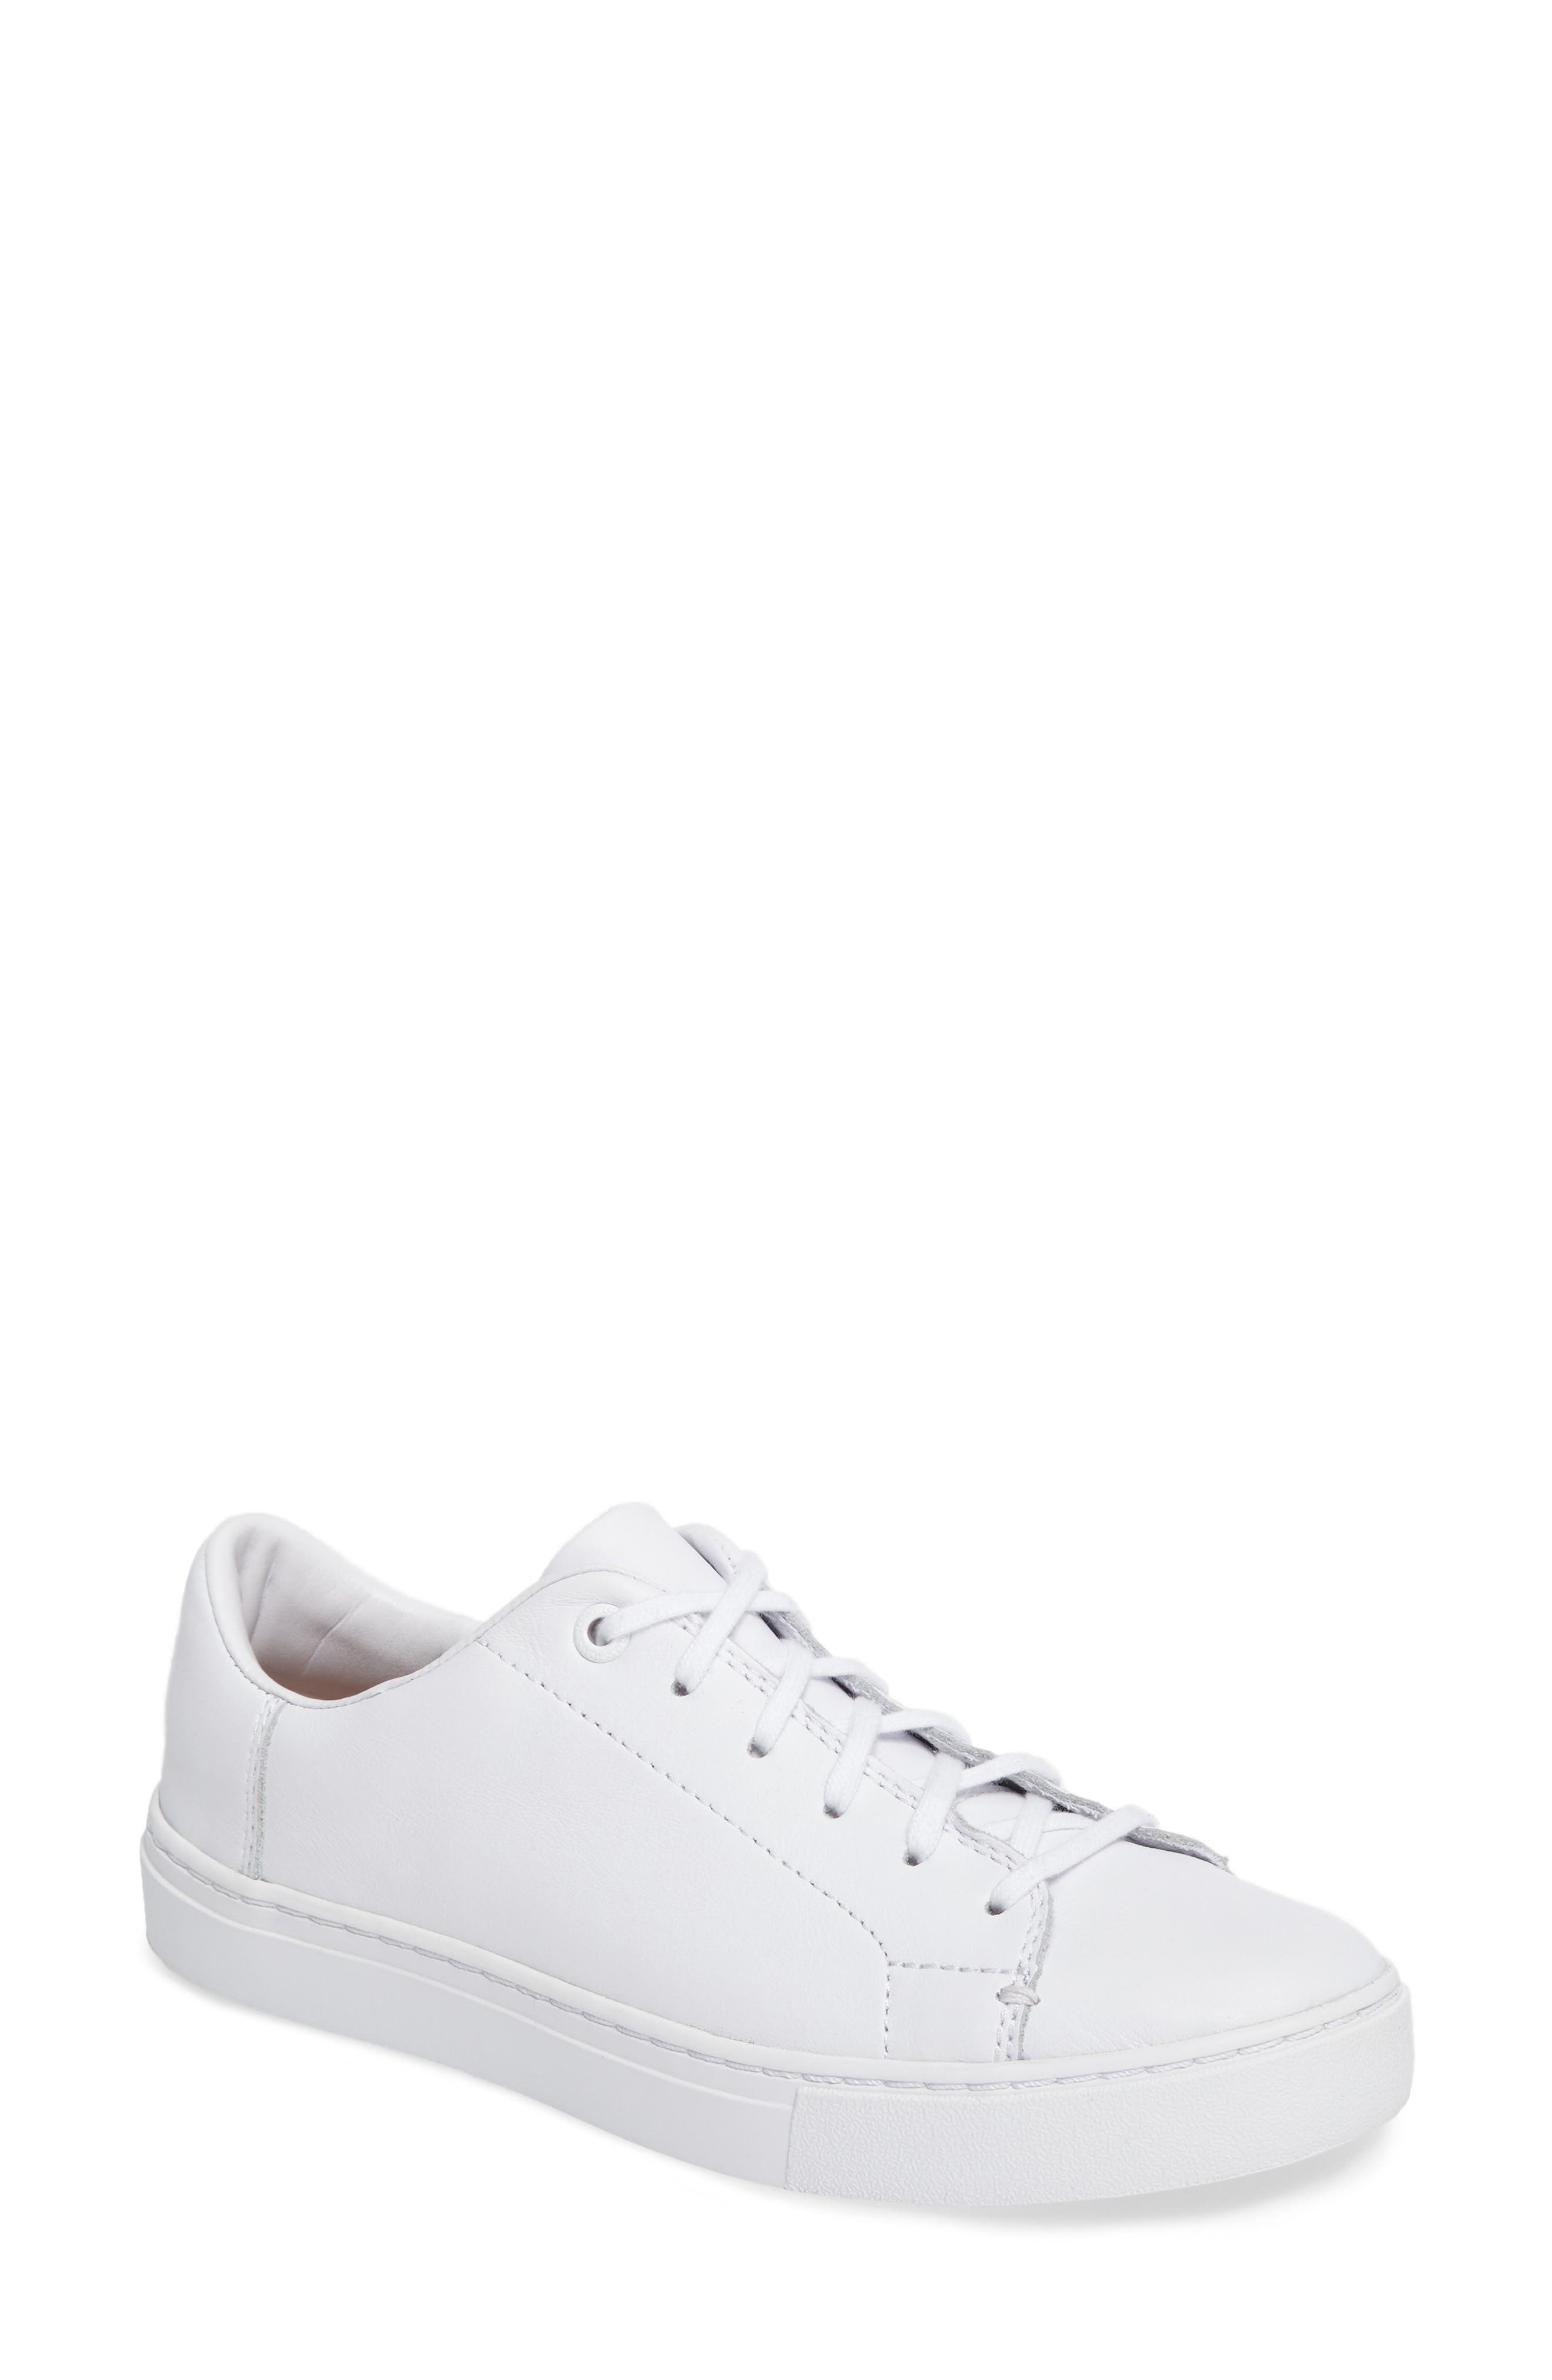 Lenox Sneaker,                             Main thumbnail 7, color,